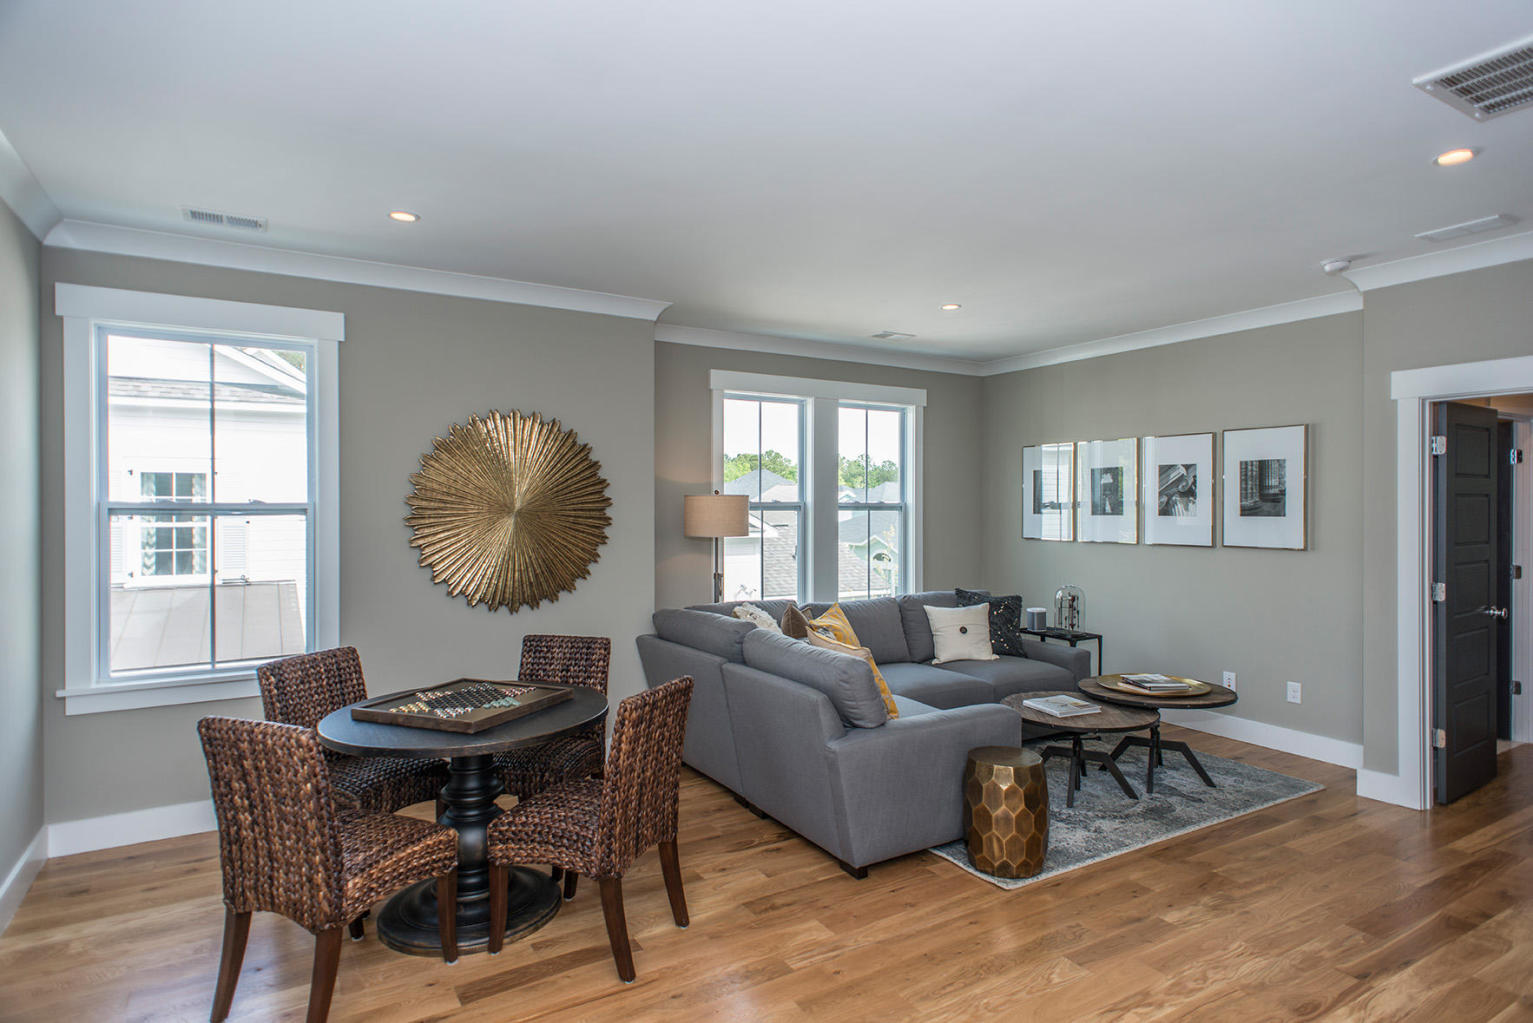 Carolina Park Homes For Sale - 1534 Banning, Mount Pleasant, SC - 1